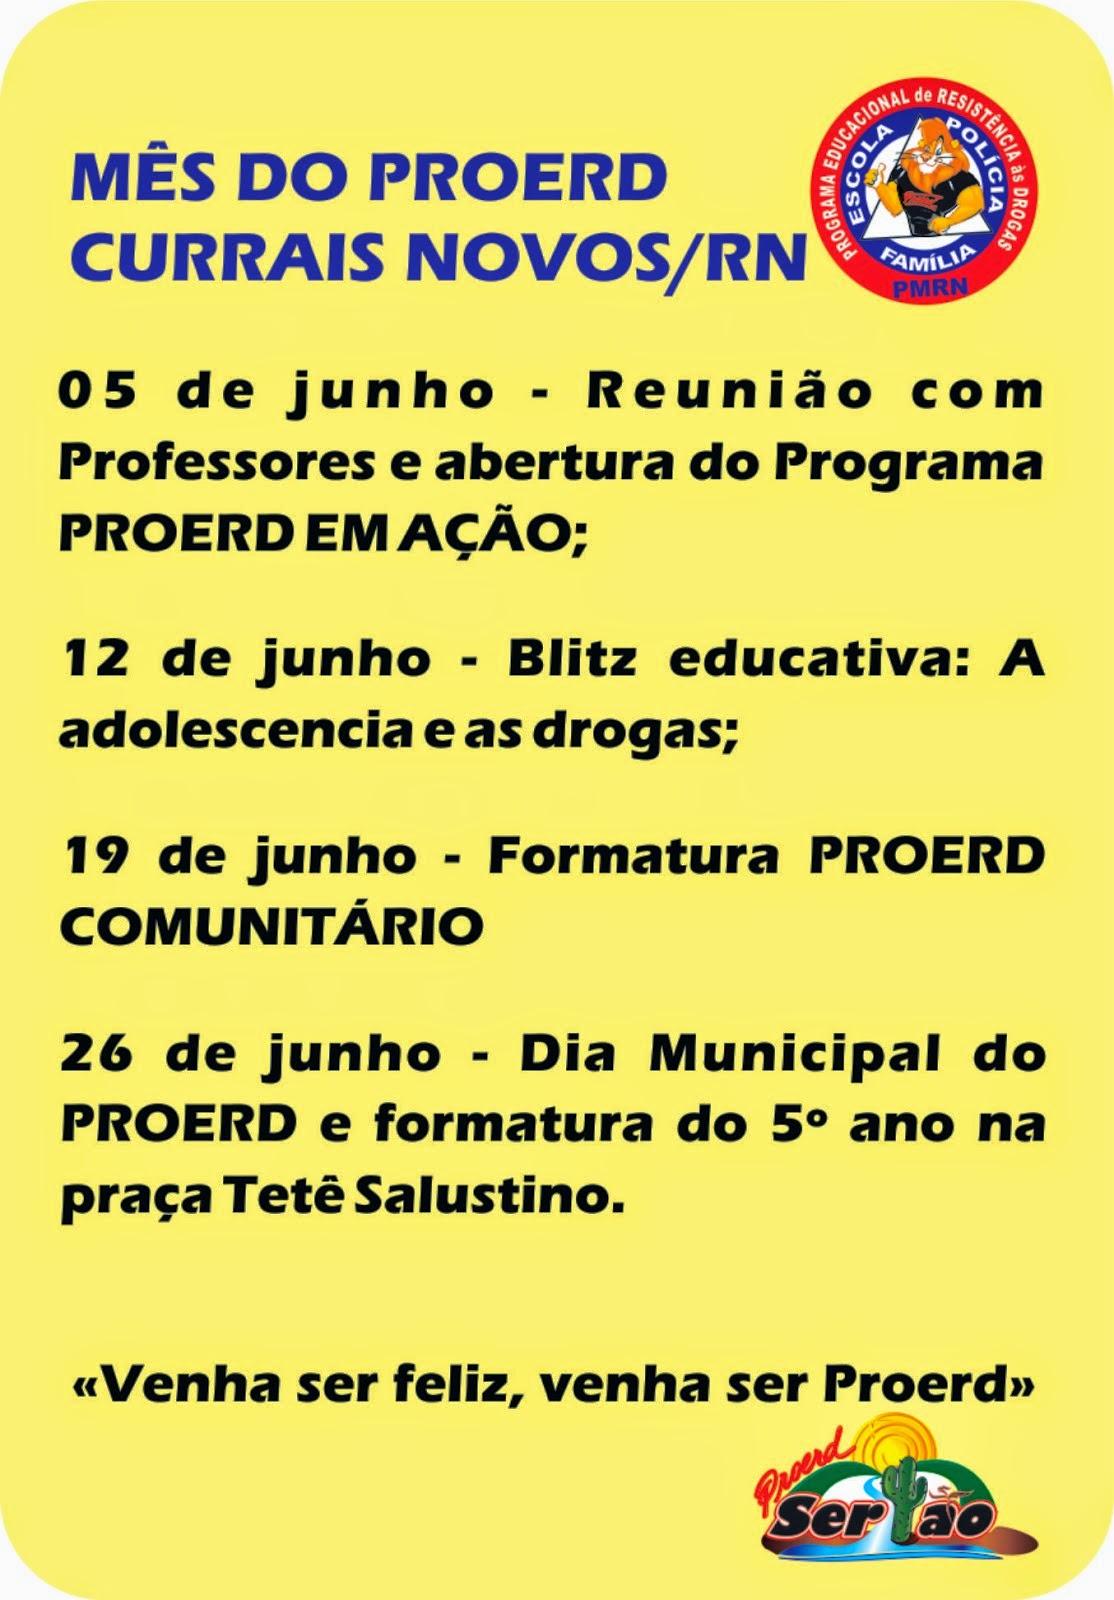 MÊS DO PROERD CURRAIS NOVOS